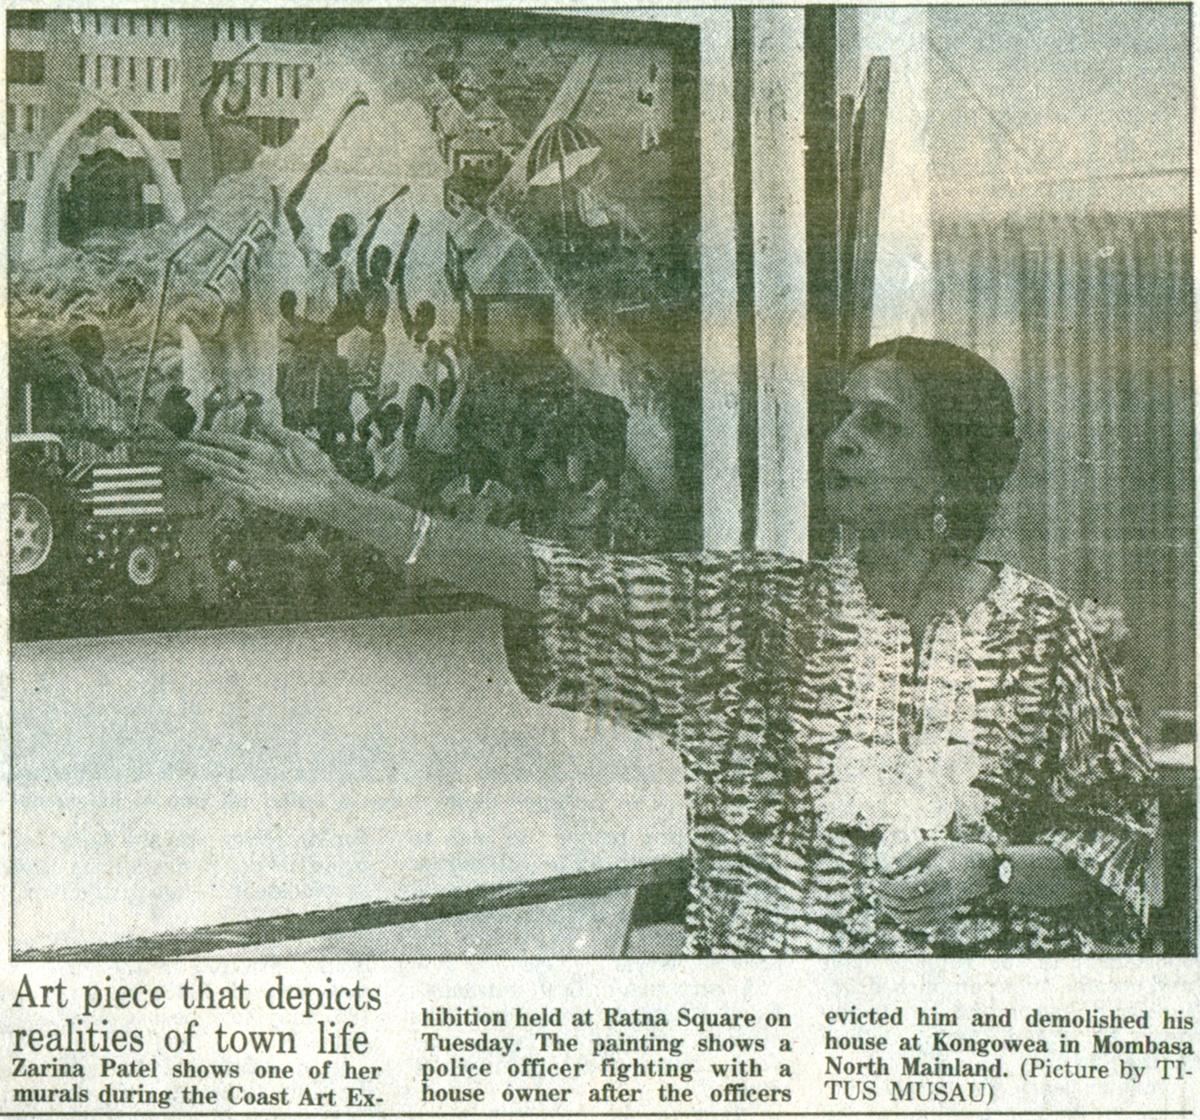 Narratives about painting kenyan history 1a